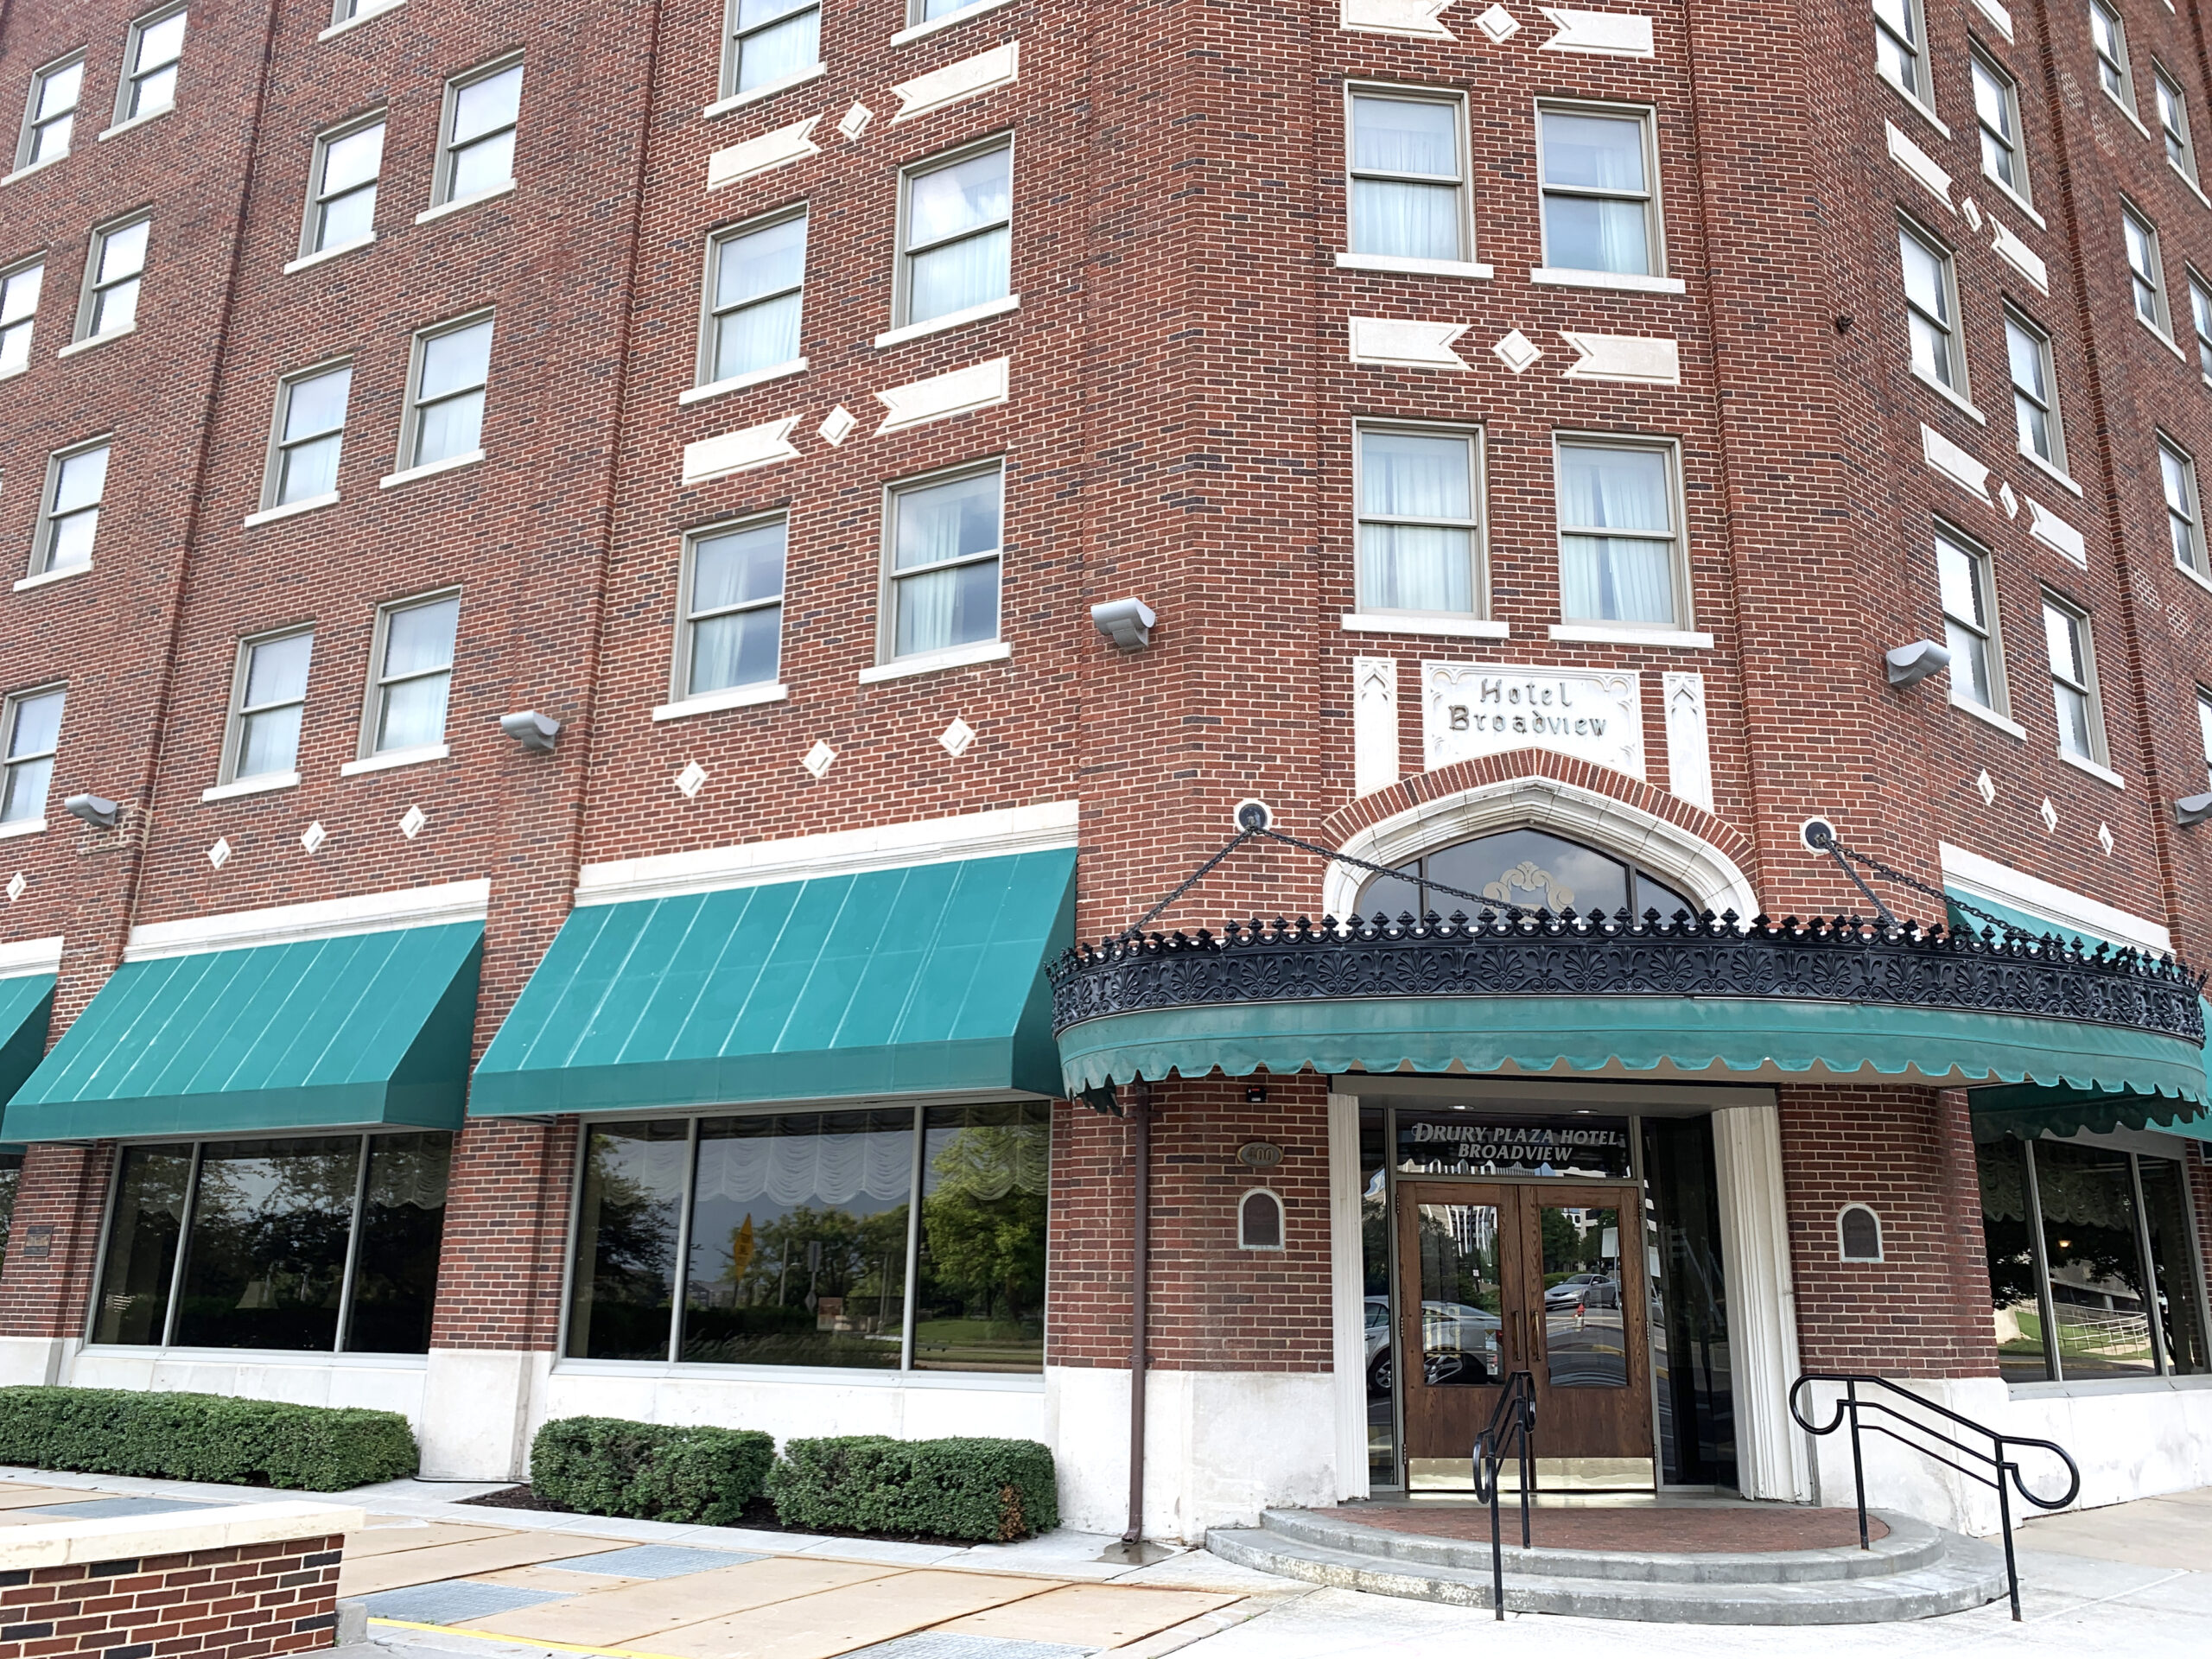 Drury Plaza Hotel Broadview